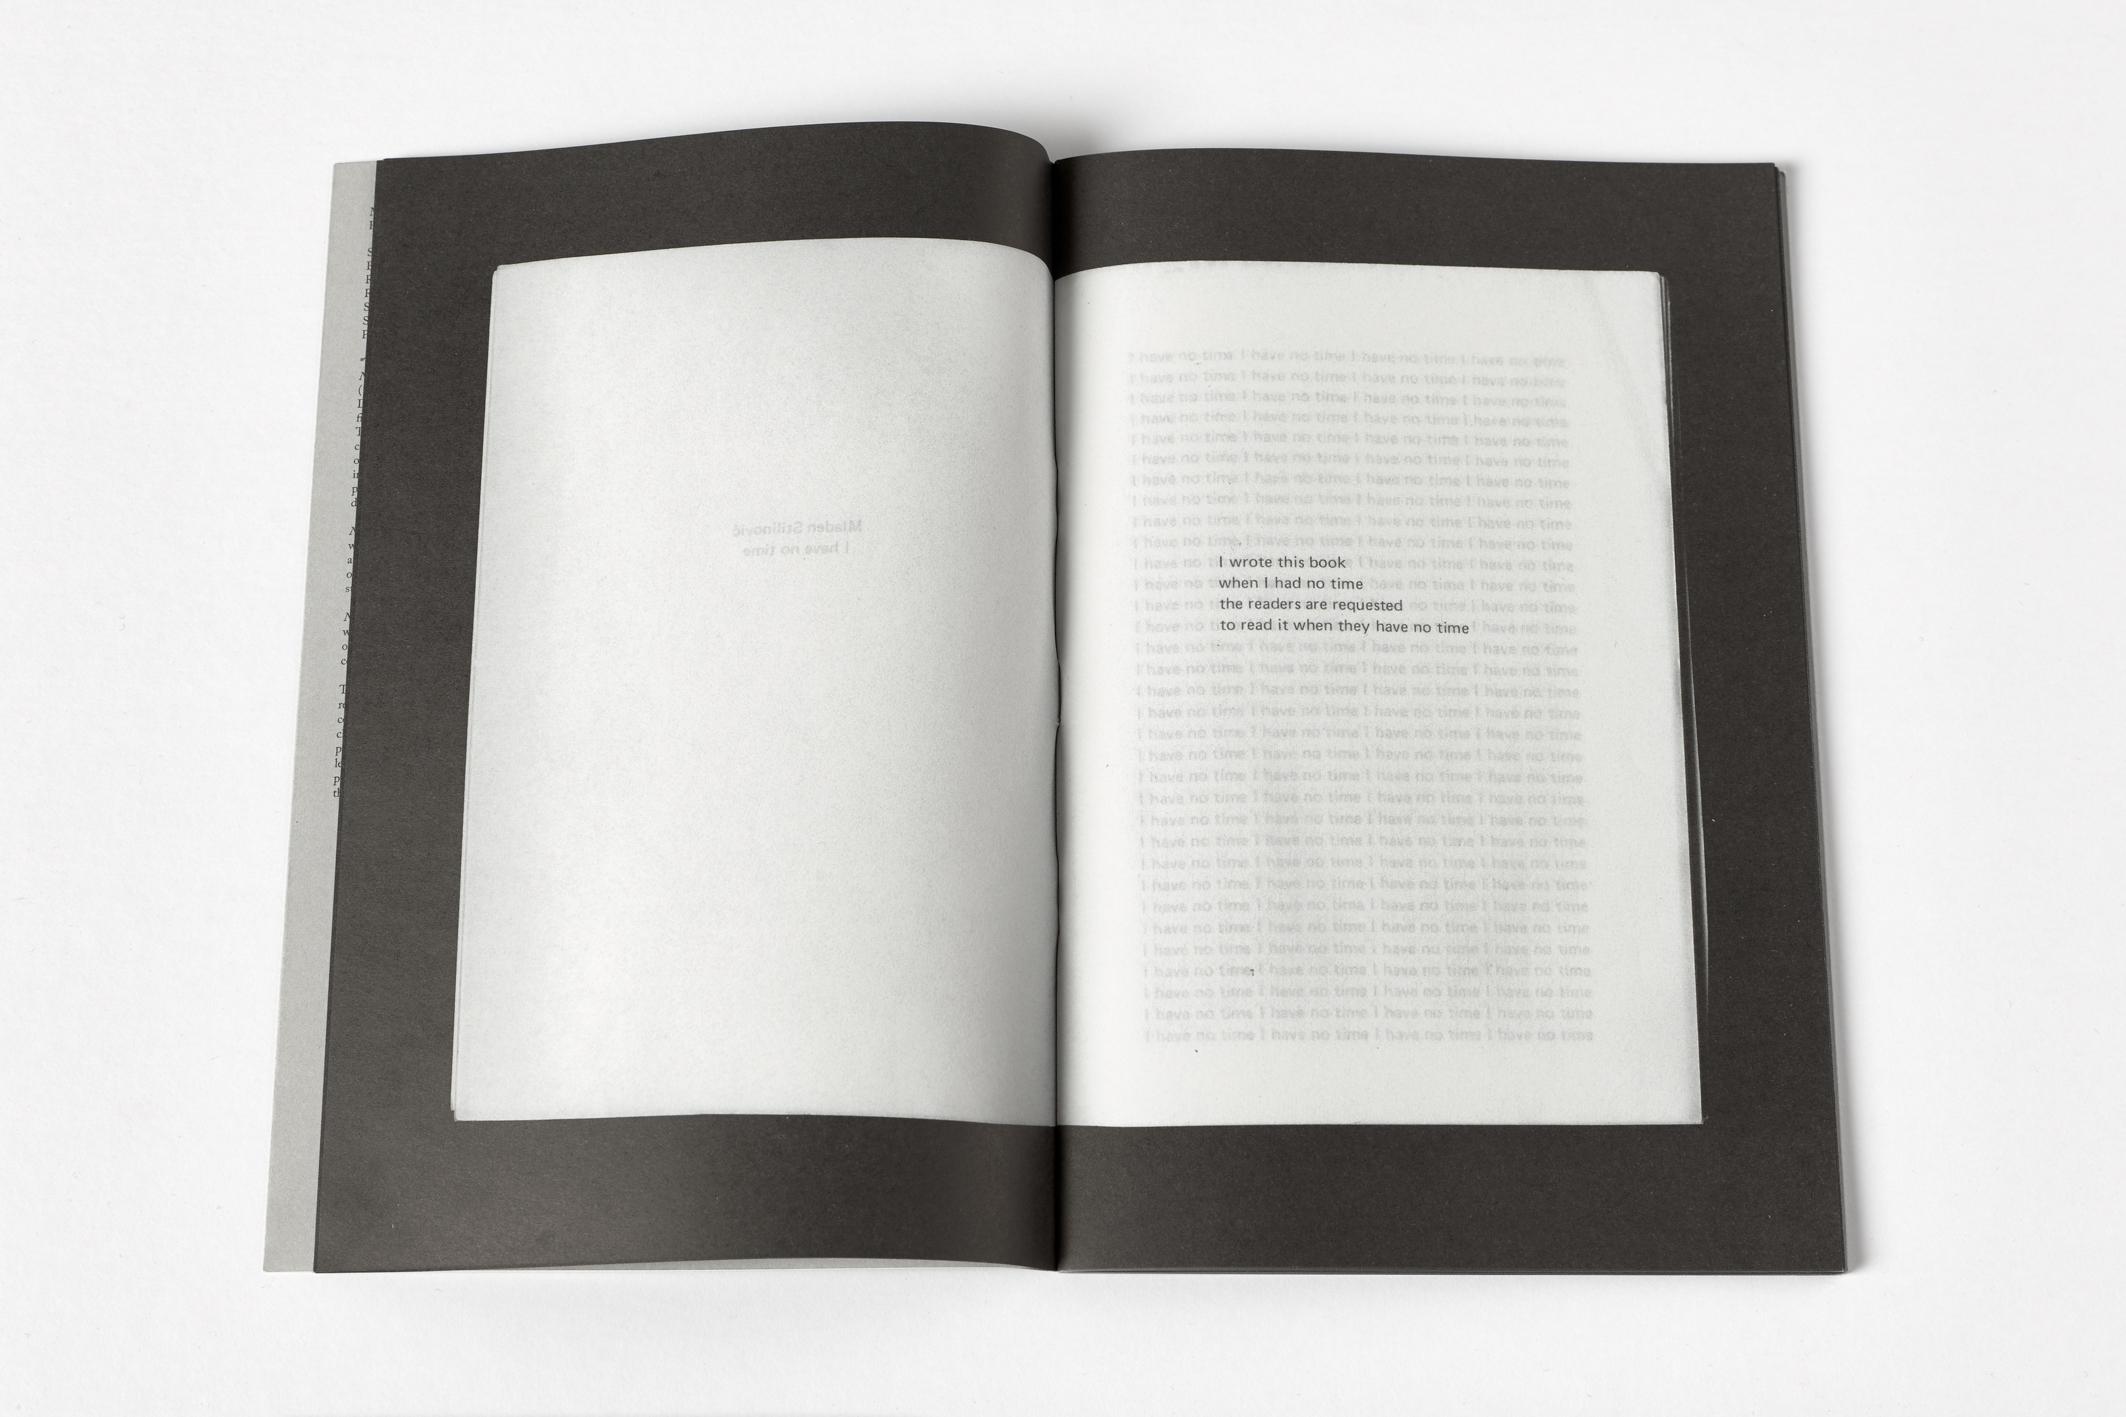 3Ply - Reprint No. 3-033.jpg